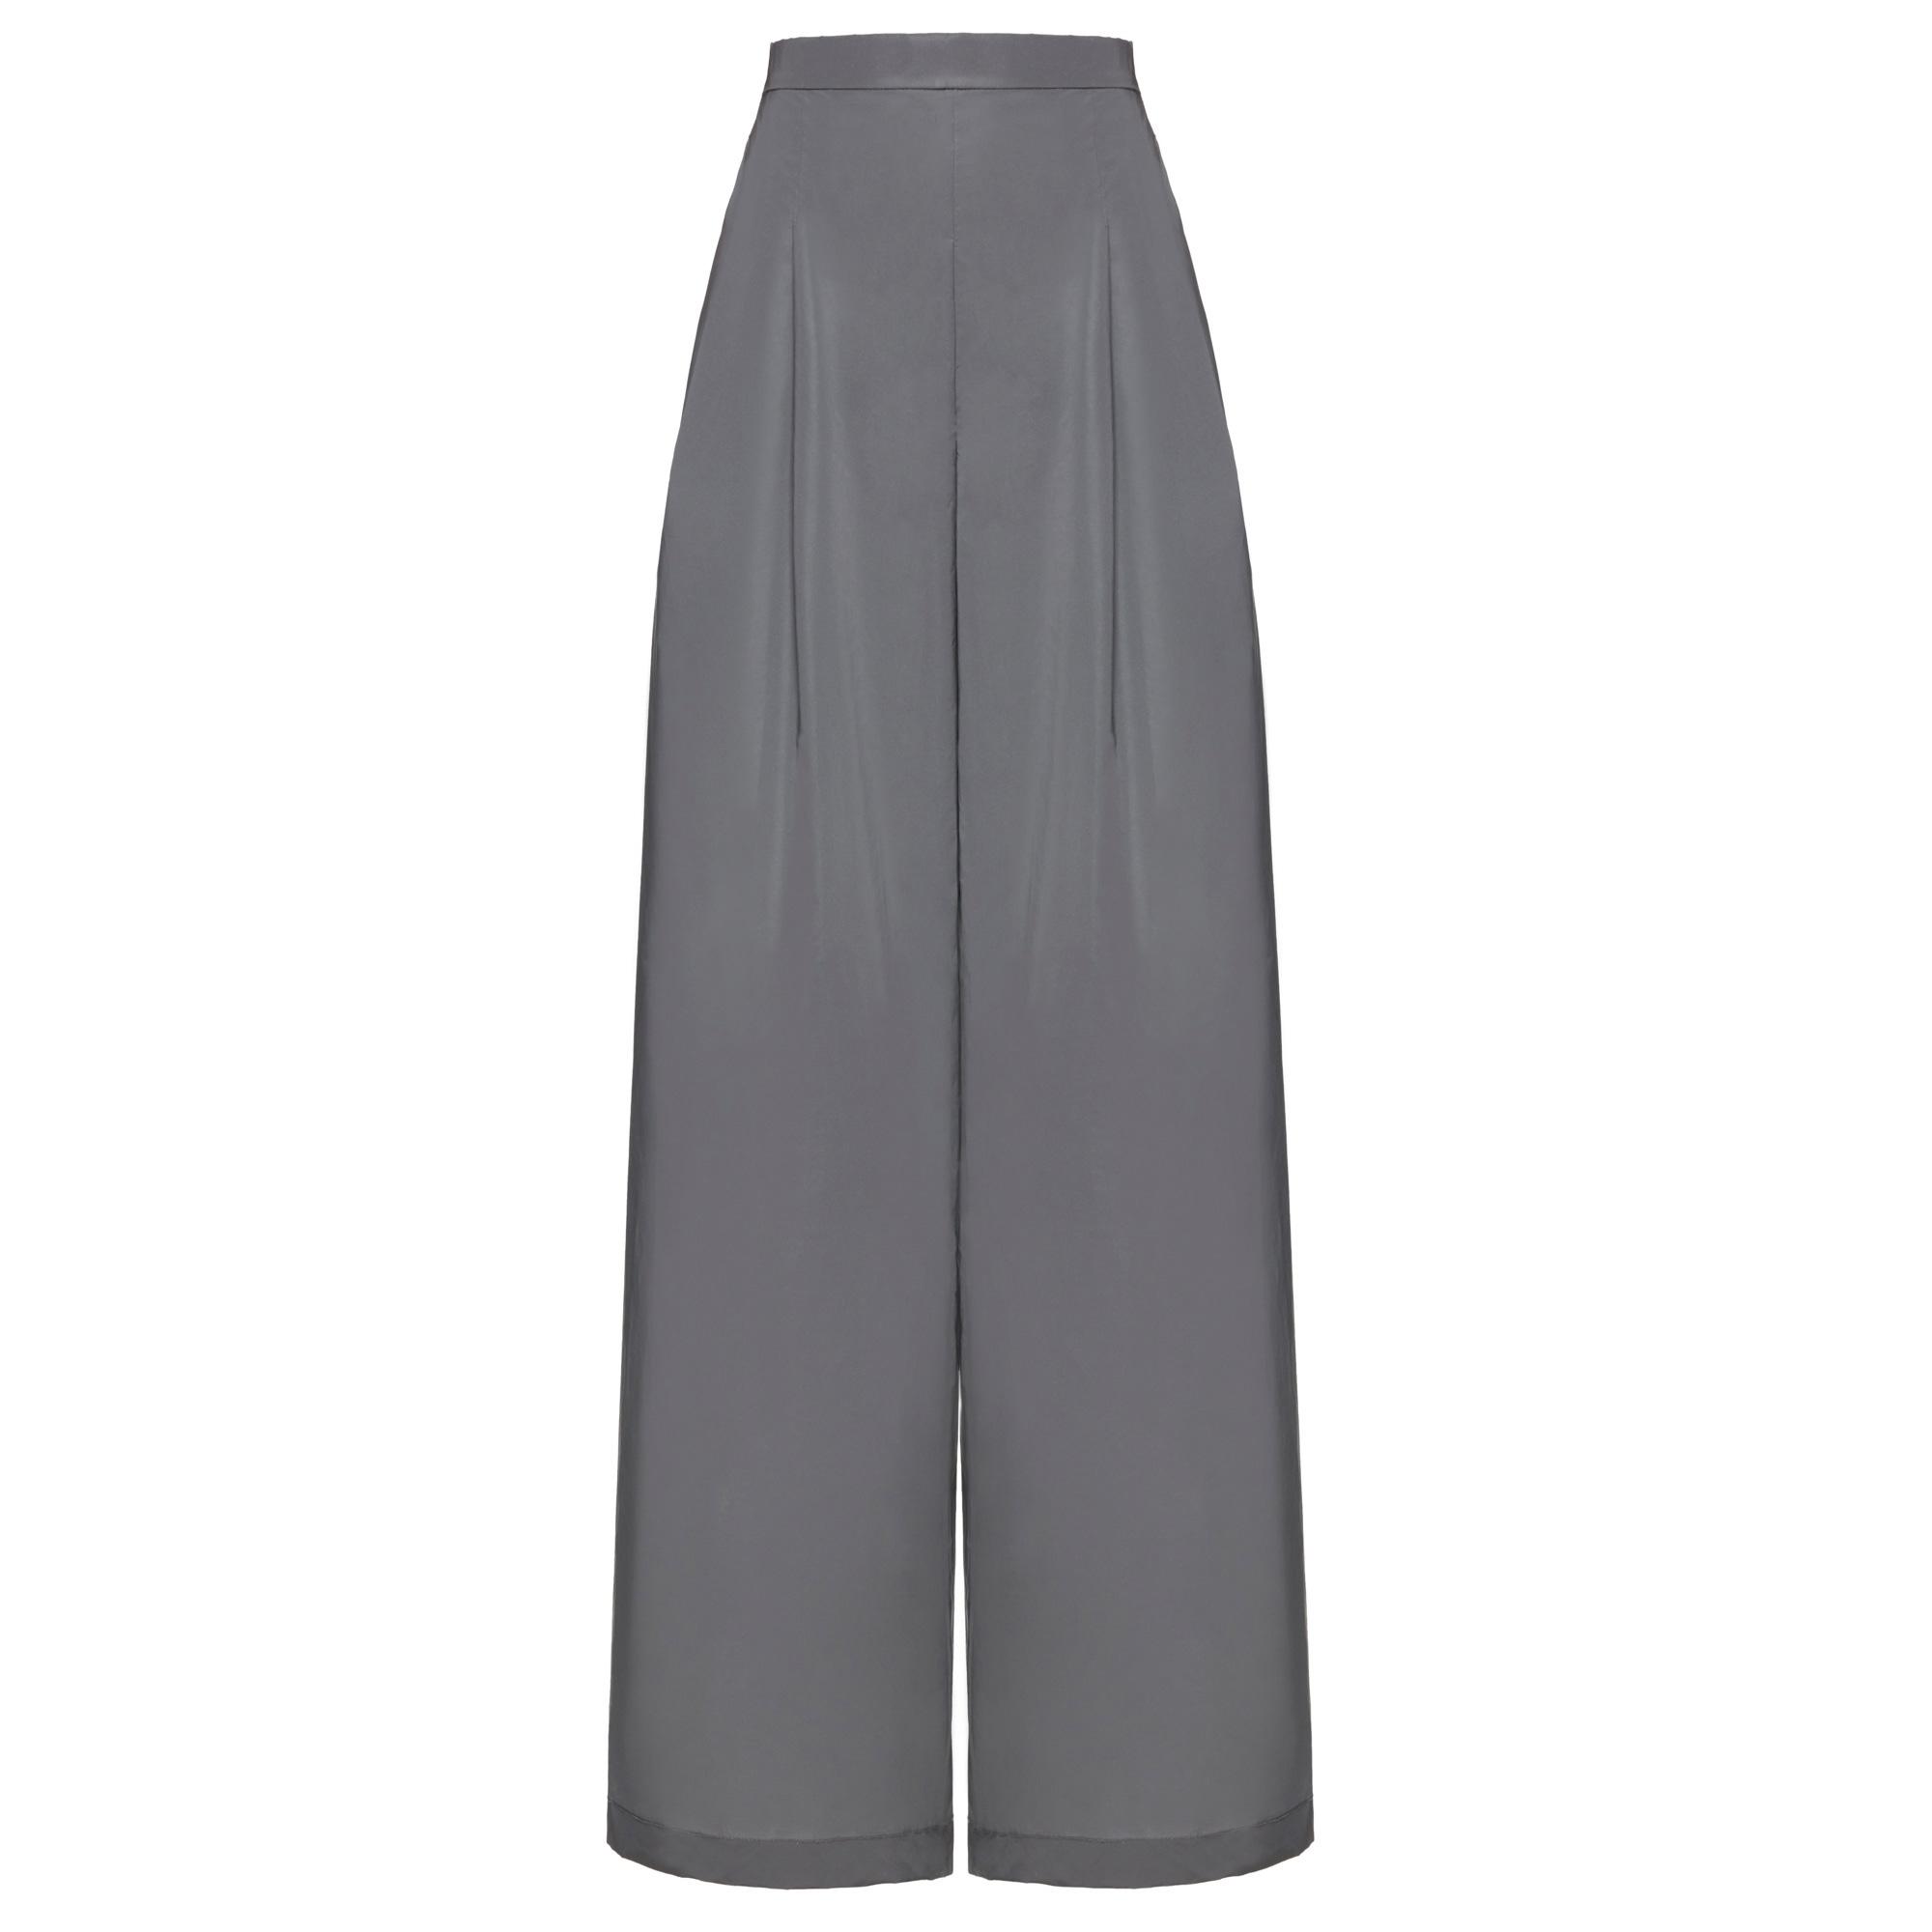 f7b45c942ac88 WANGLILING Silver Reflective Wide-Leg Pants - WOMEN from Fashion ...